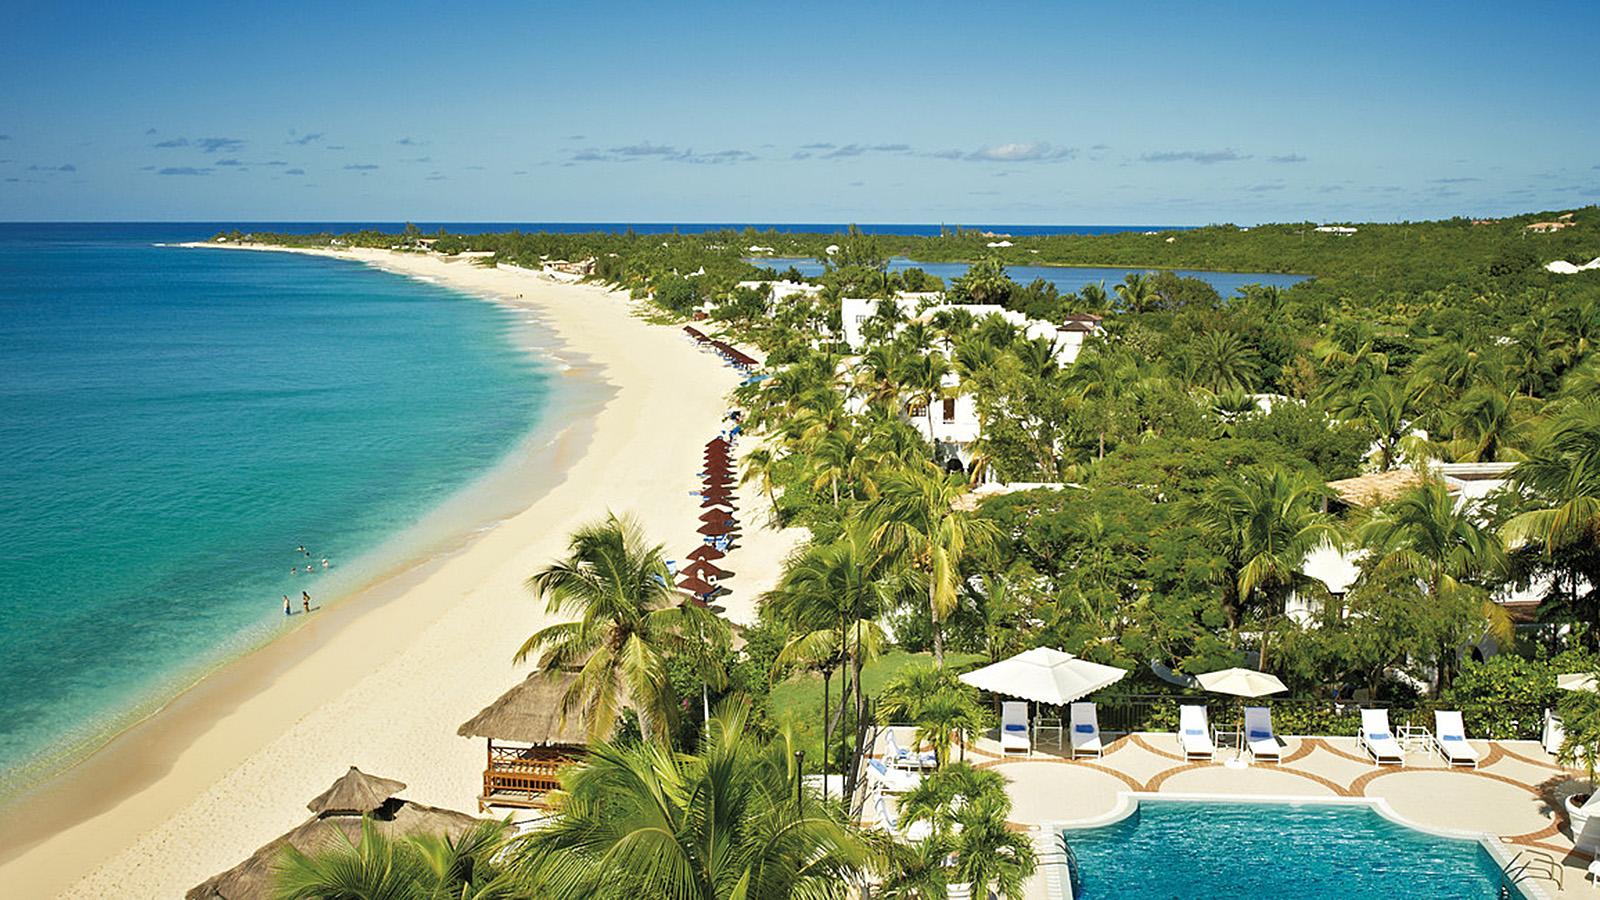 15 most beautiful island hotels around the world | cnn travel